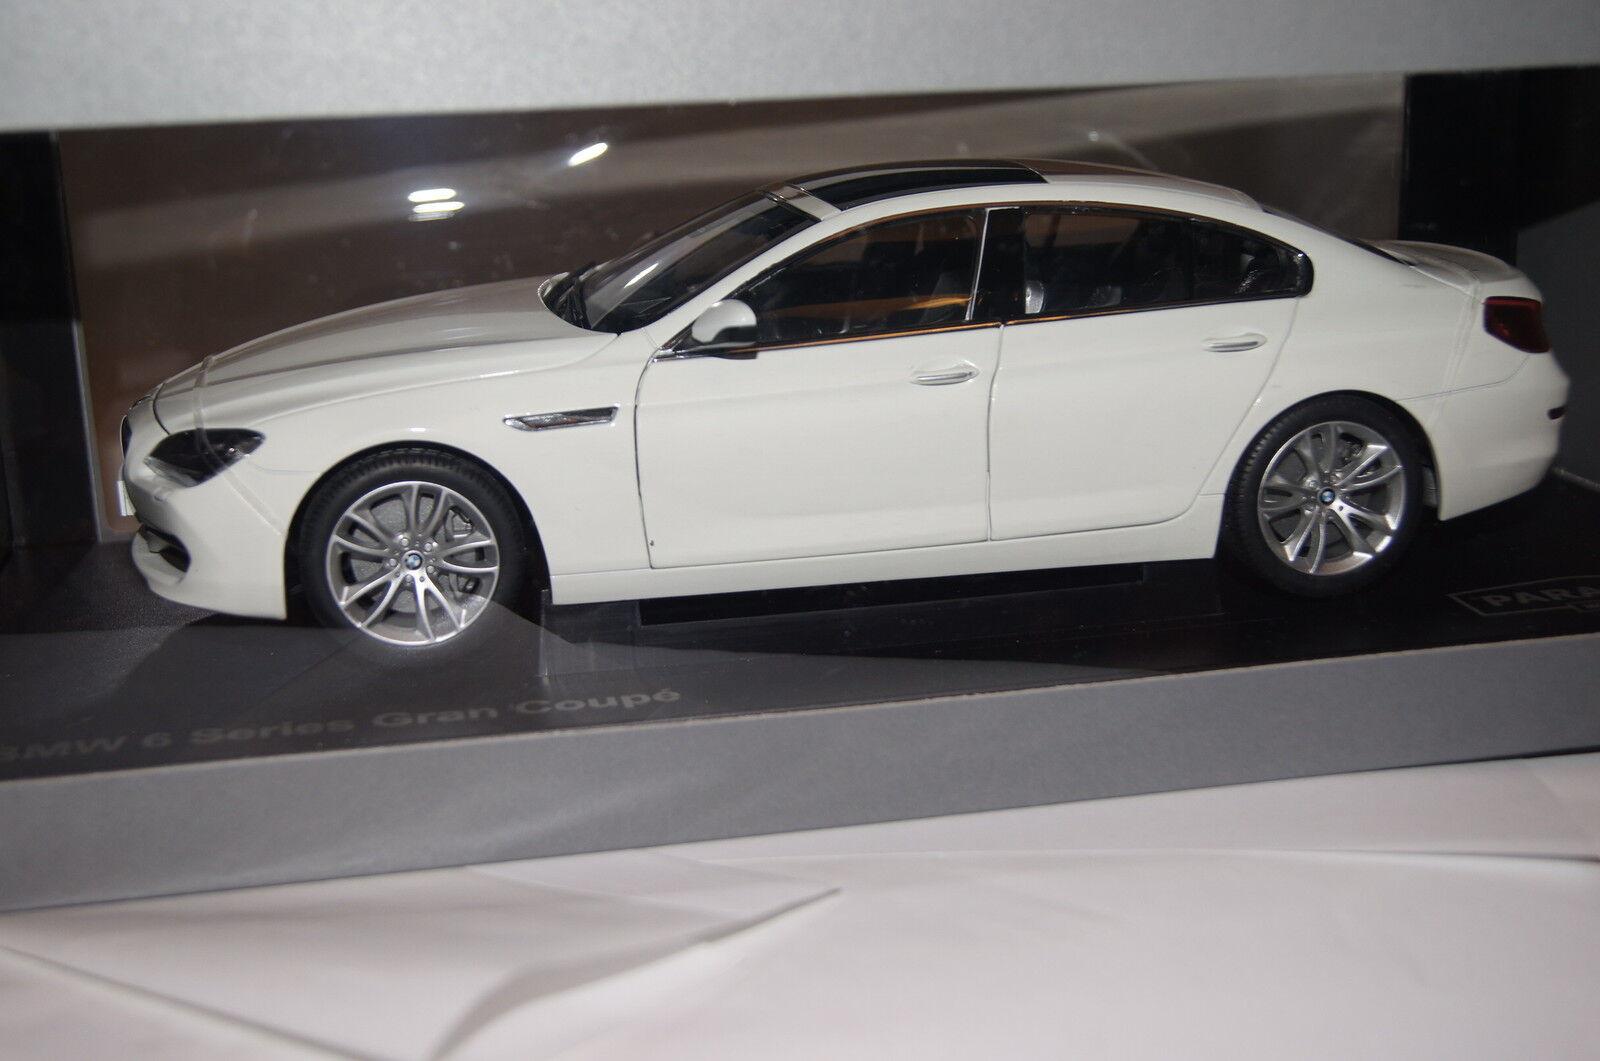 BMW 6er Gran Coupé f06 2013 Alpine Blanc 1 18 Paragon NOUVEAU & NEUF dans sa boîte 97032